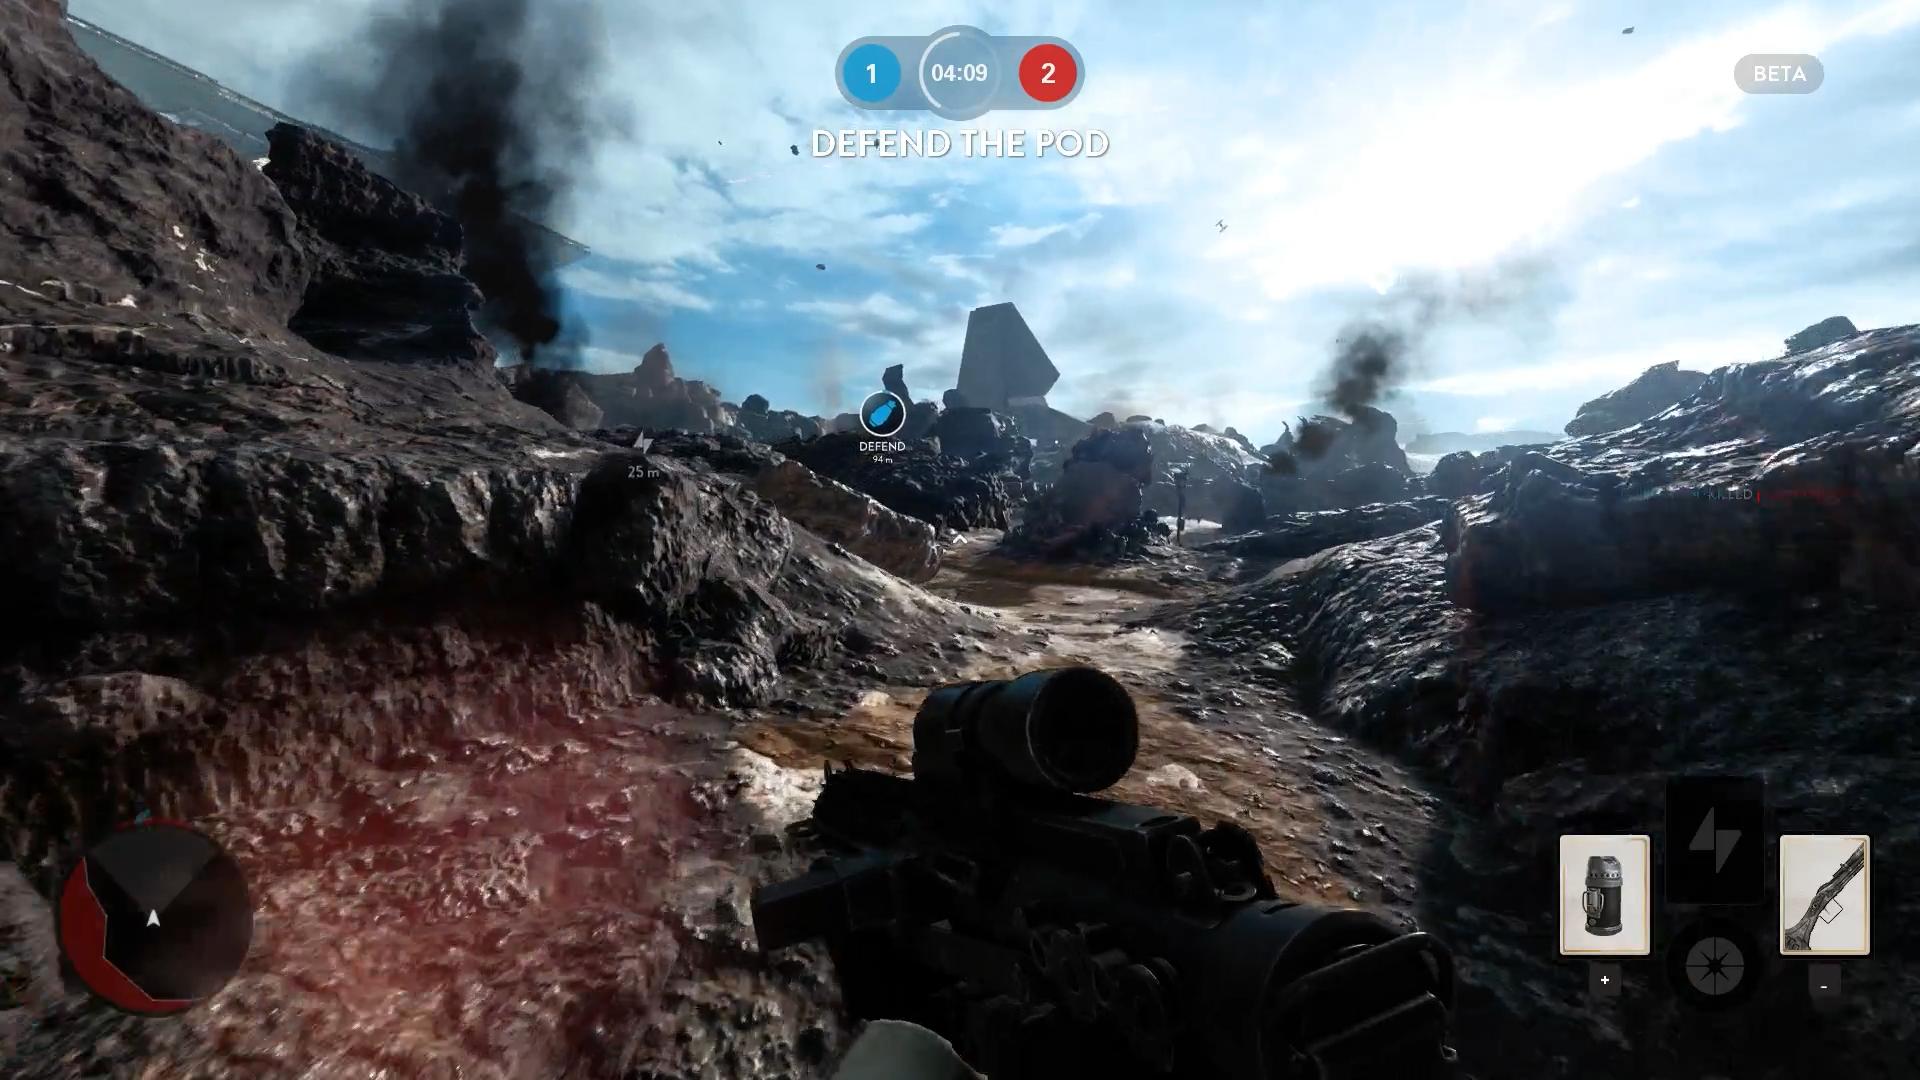 Star Wars: Battlefront aneb DICE trochu jinak 10916